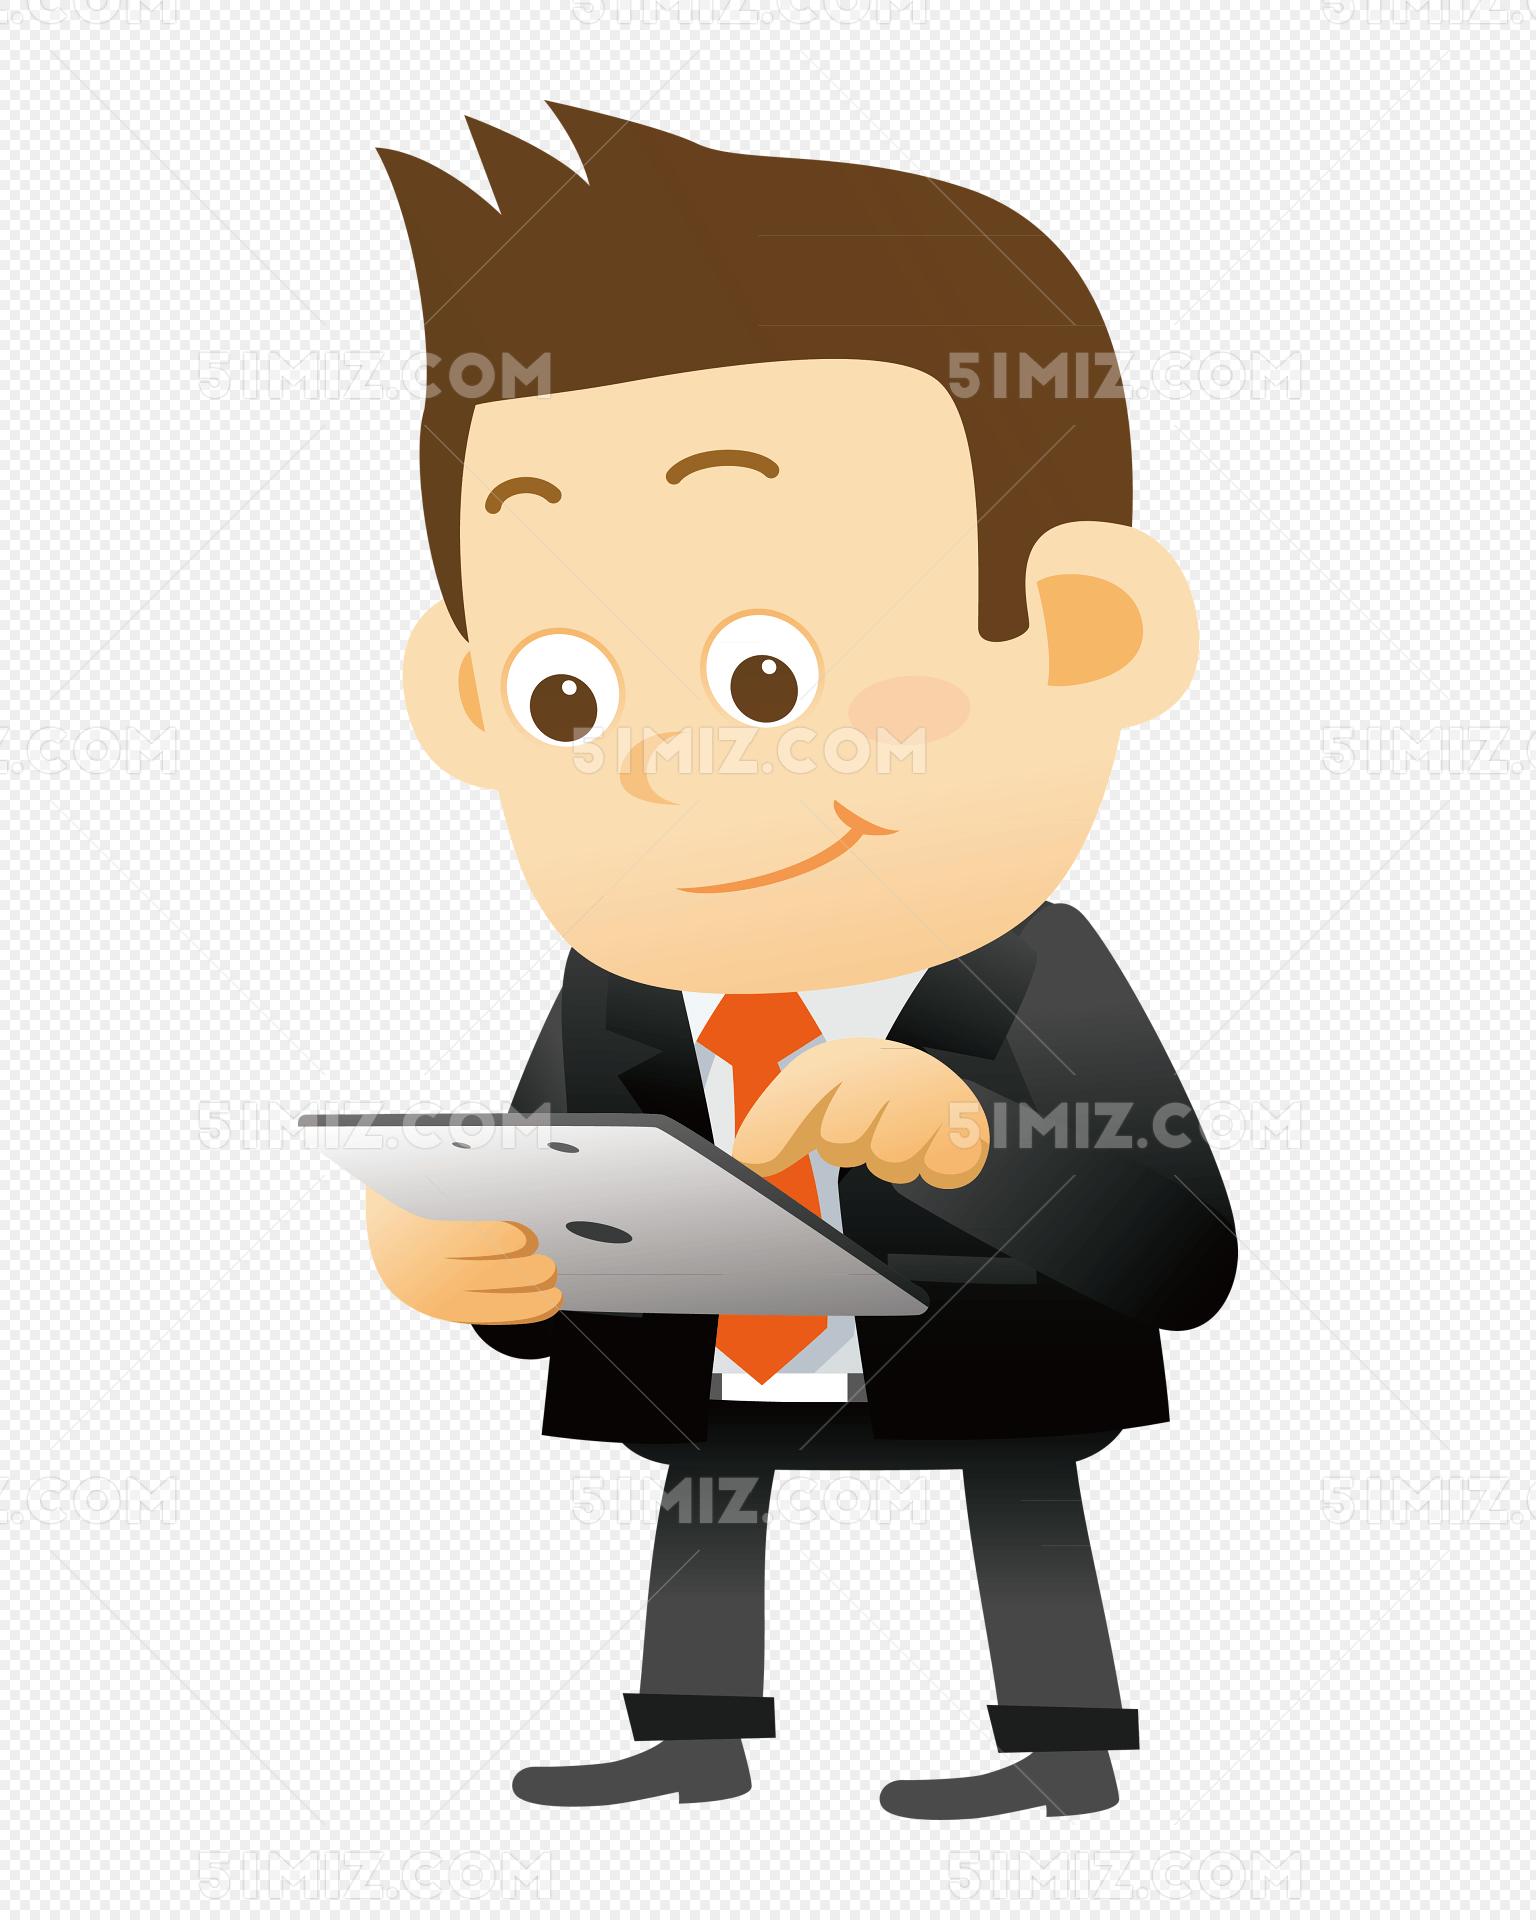 ppt商务小人图片素材免费下载_觅知网